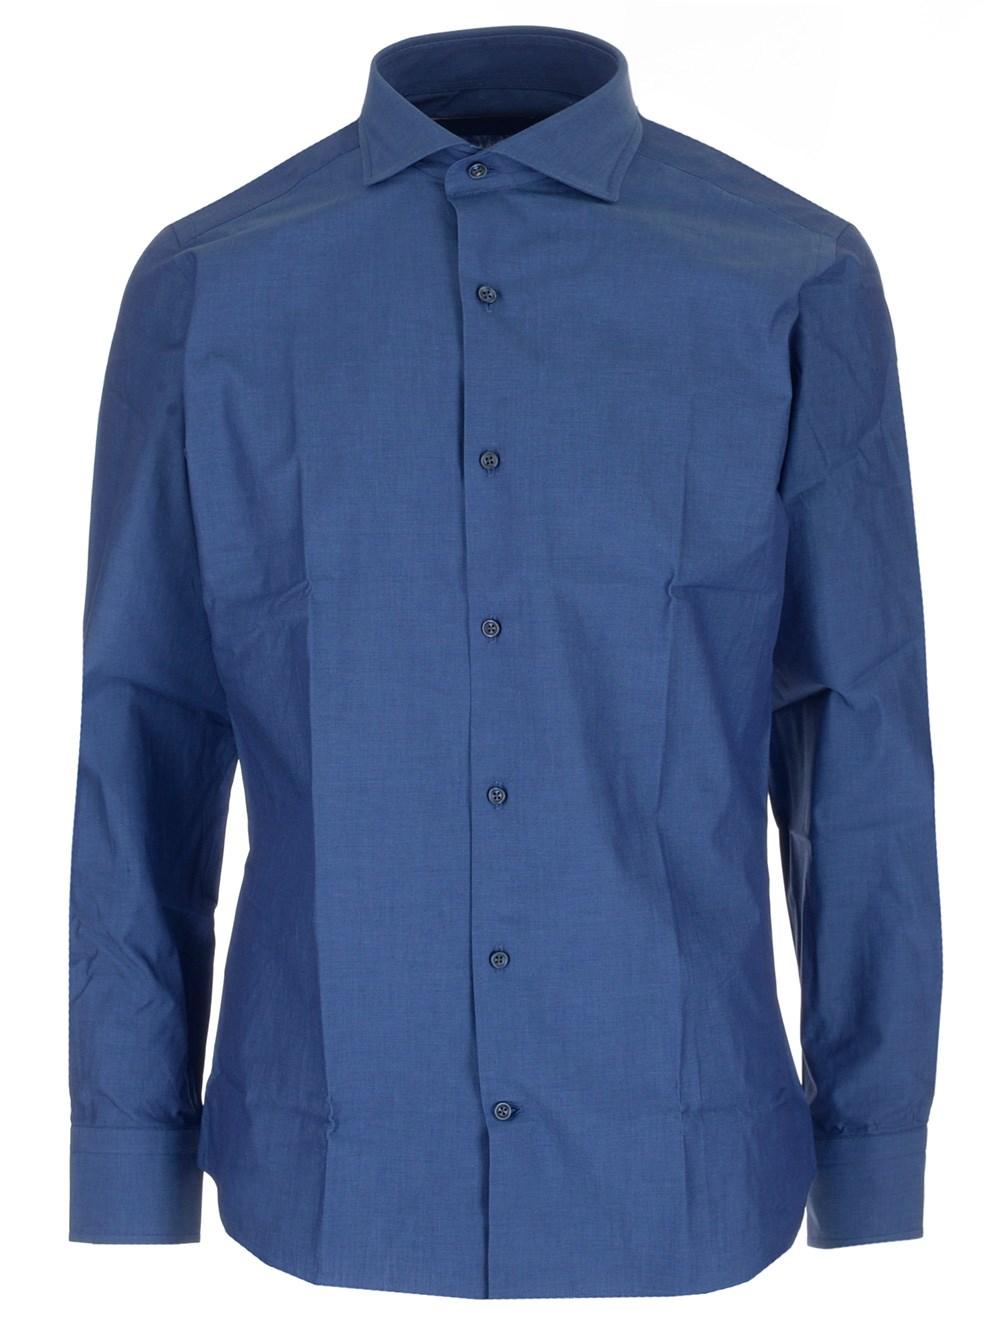 AL DUCA D'AOSTA Blue Cotton Shirt